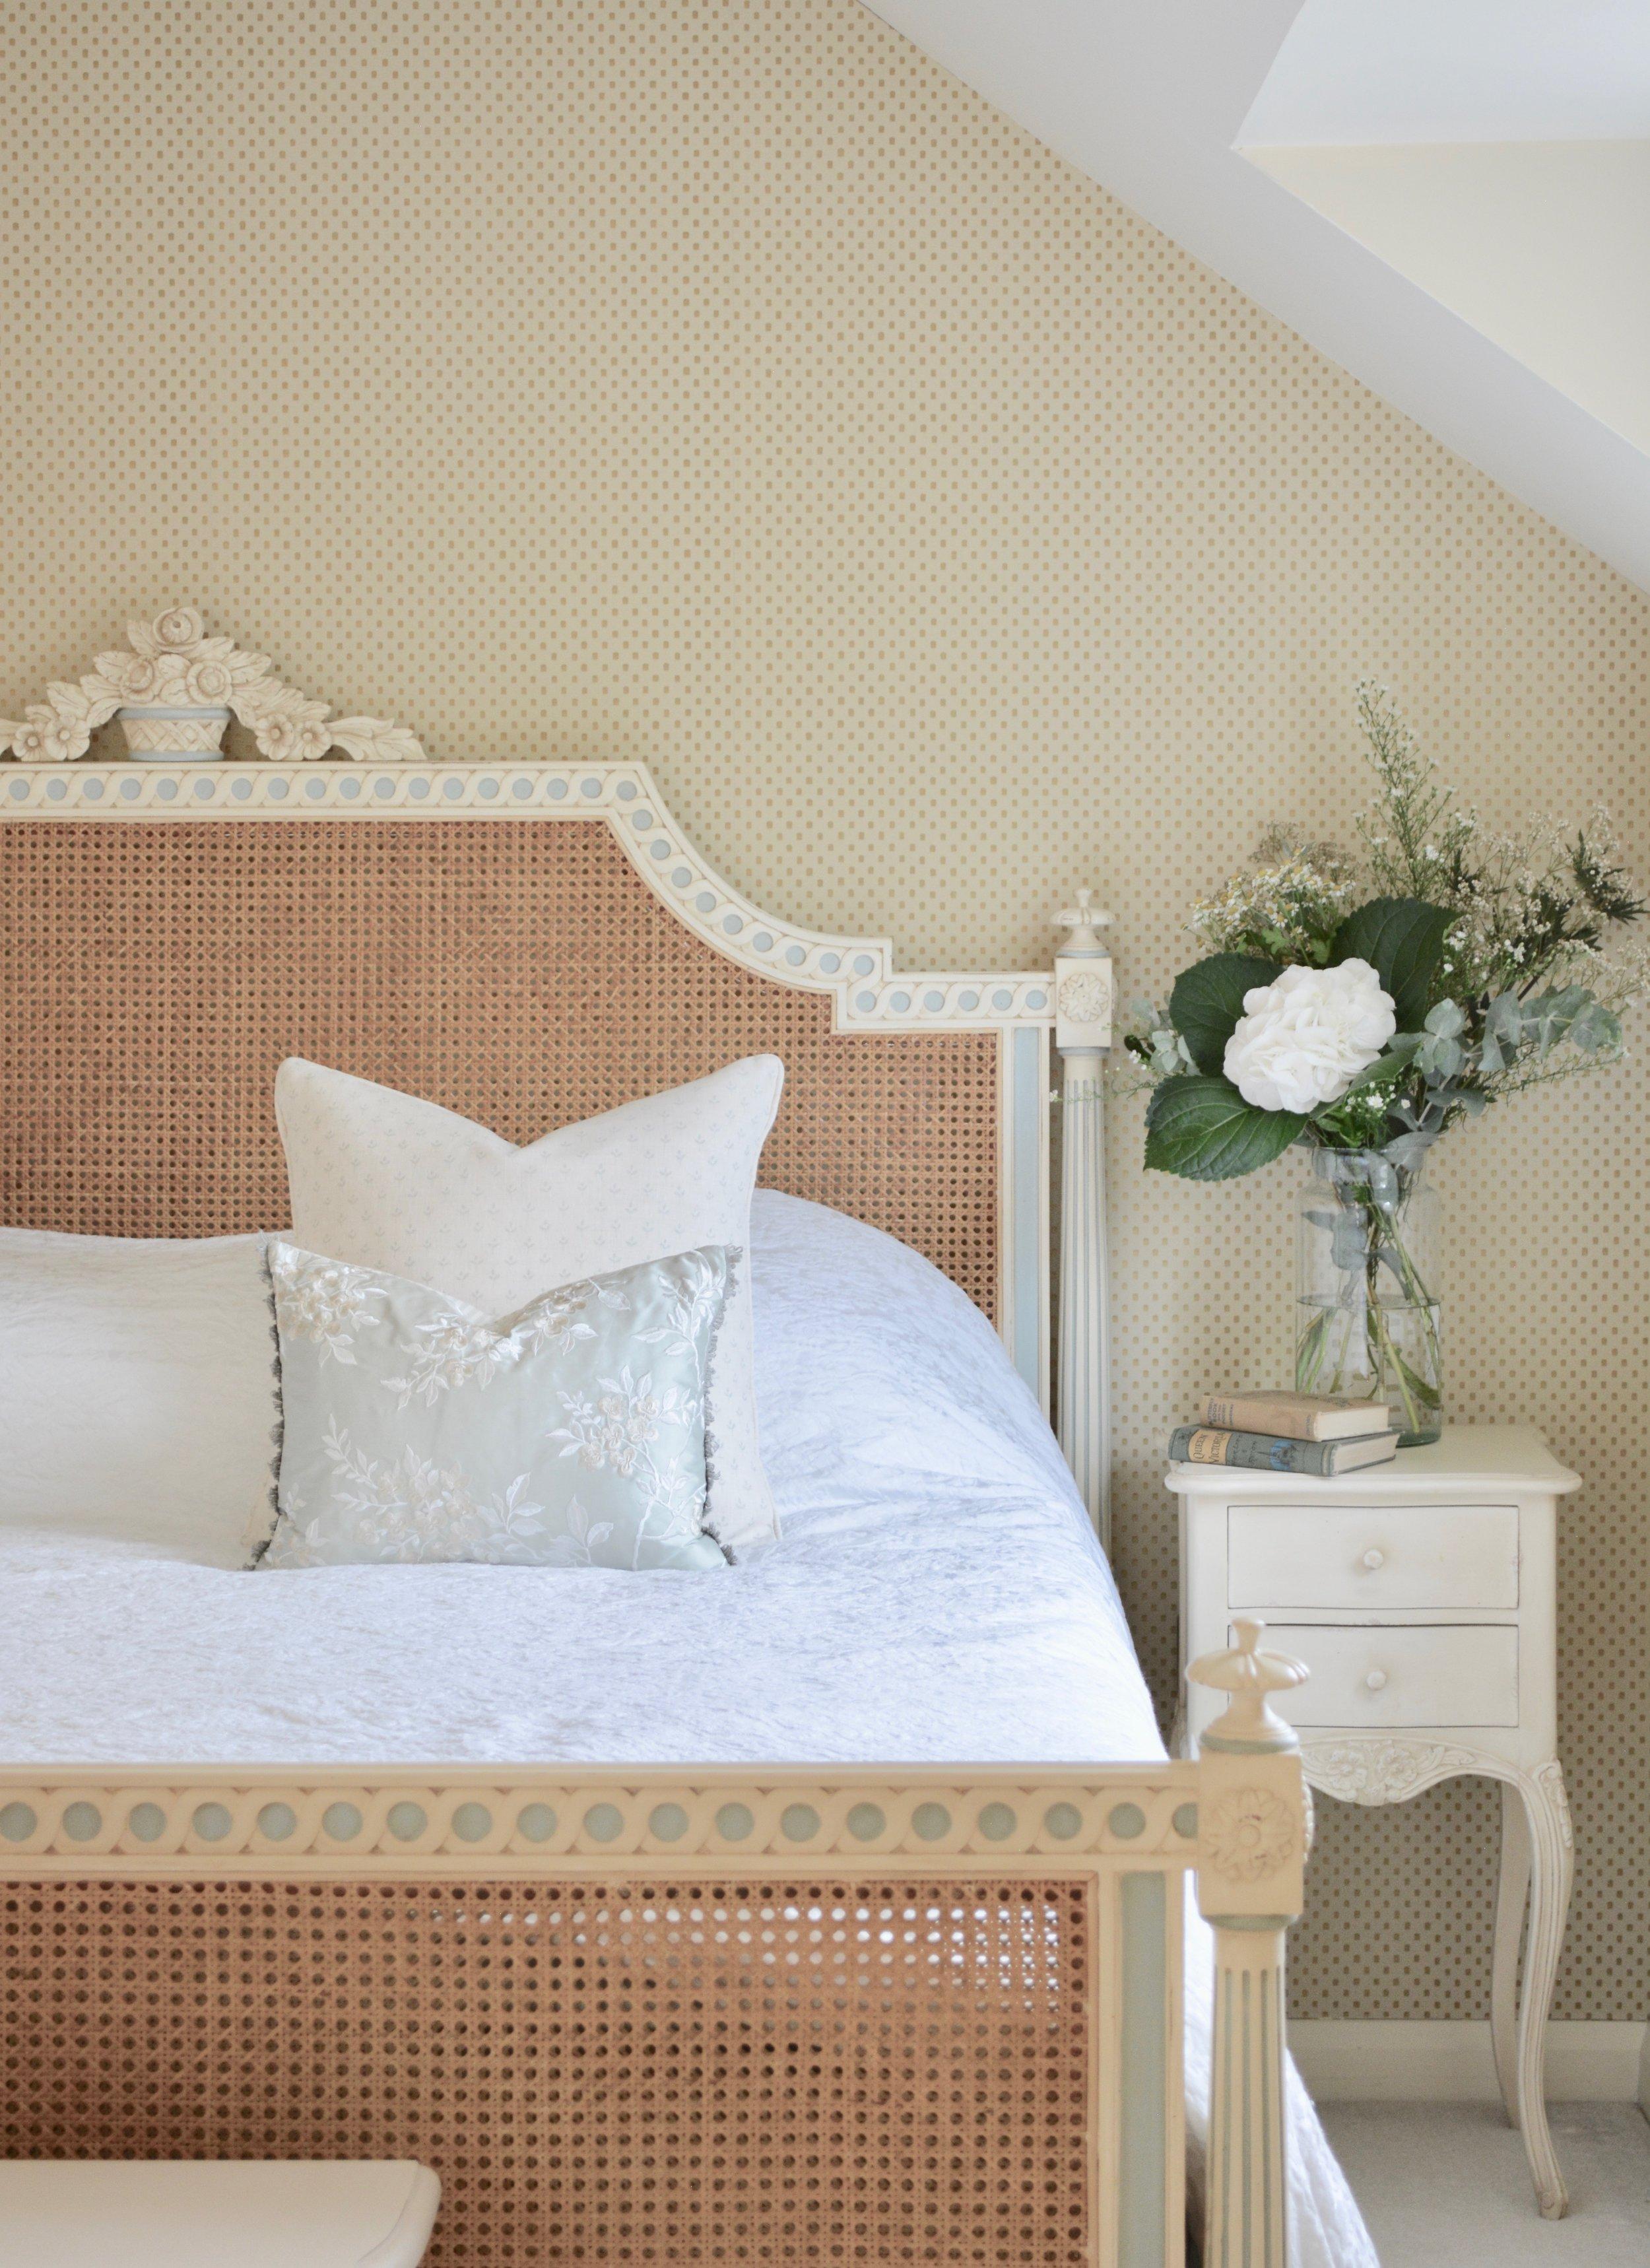 Country Cottage Bedroom Designed by Hannah Llewelyn Interior Design www.hlinteriors.co.uk 2.jpg